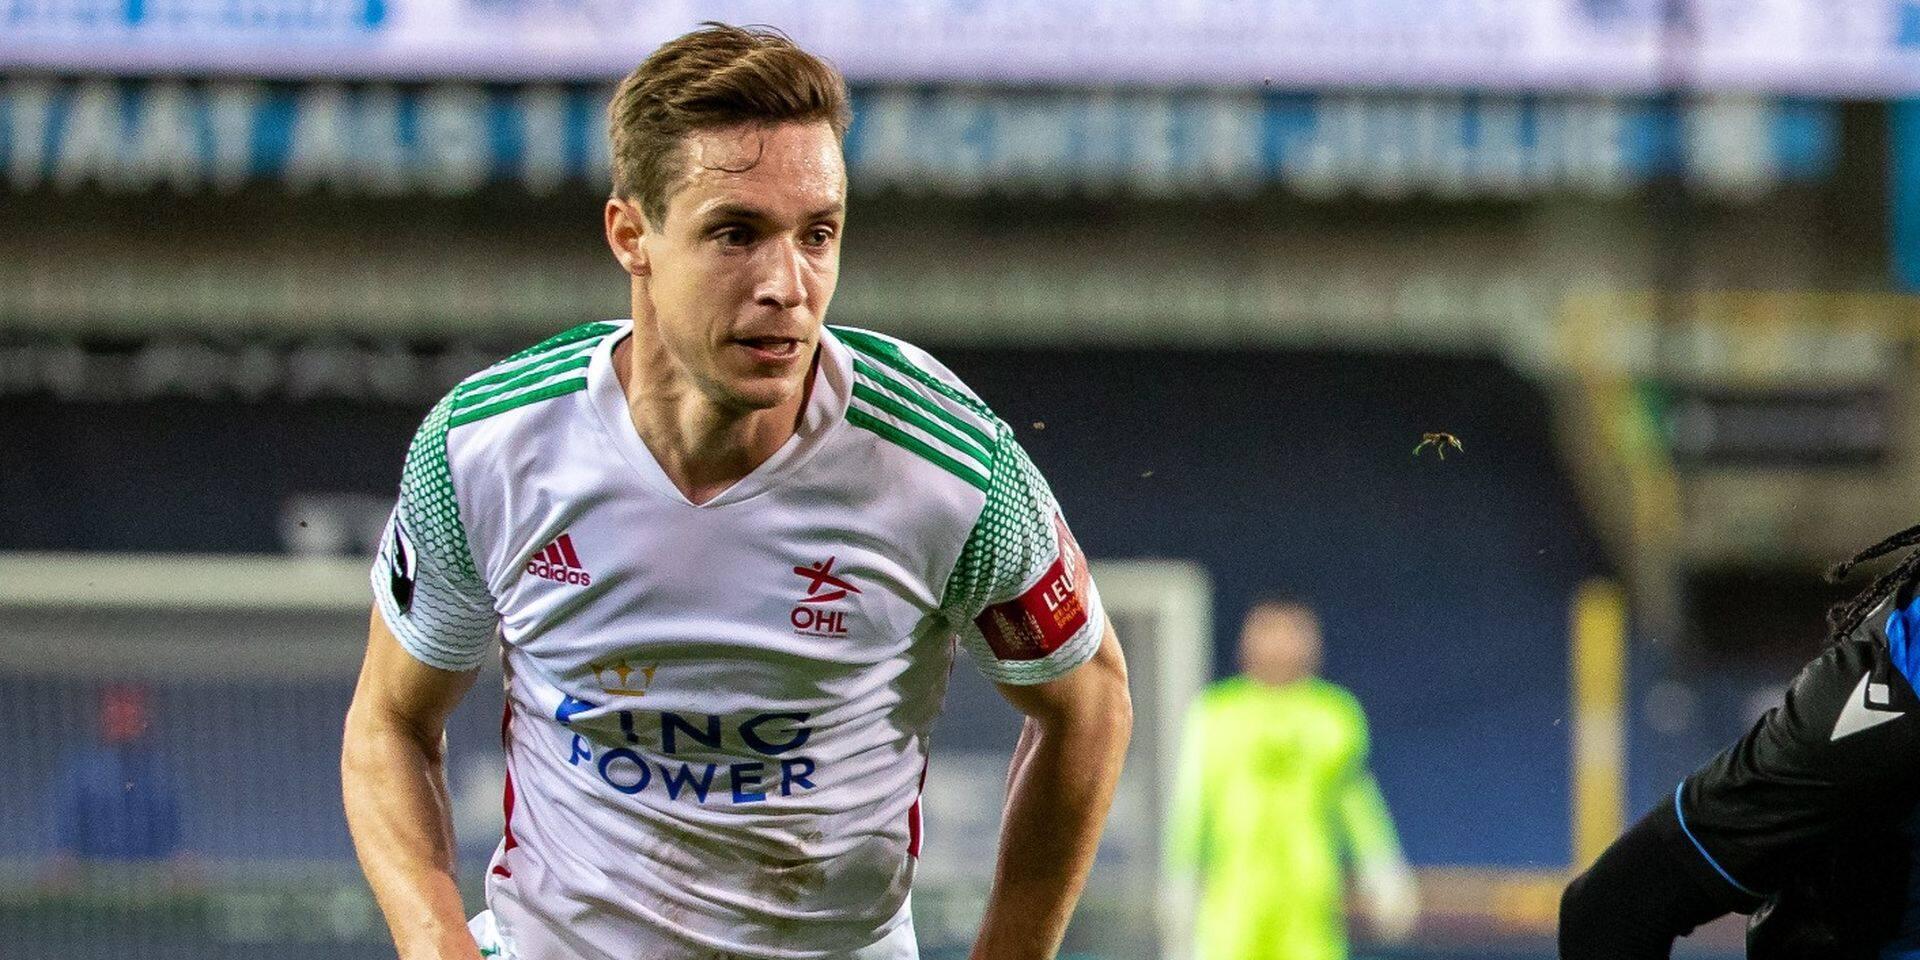 David Hubert quitte OHL pour rejoindre Zulte Waregem